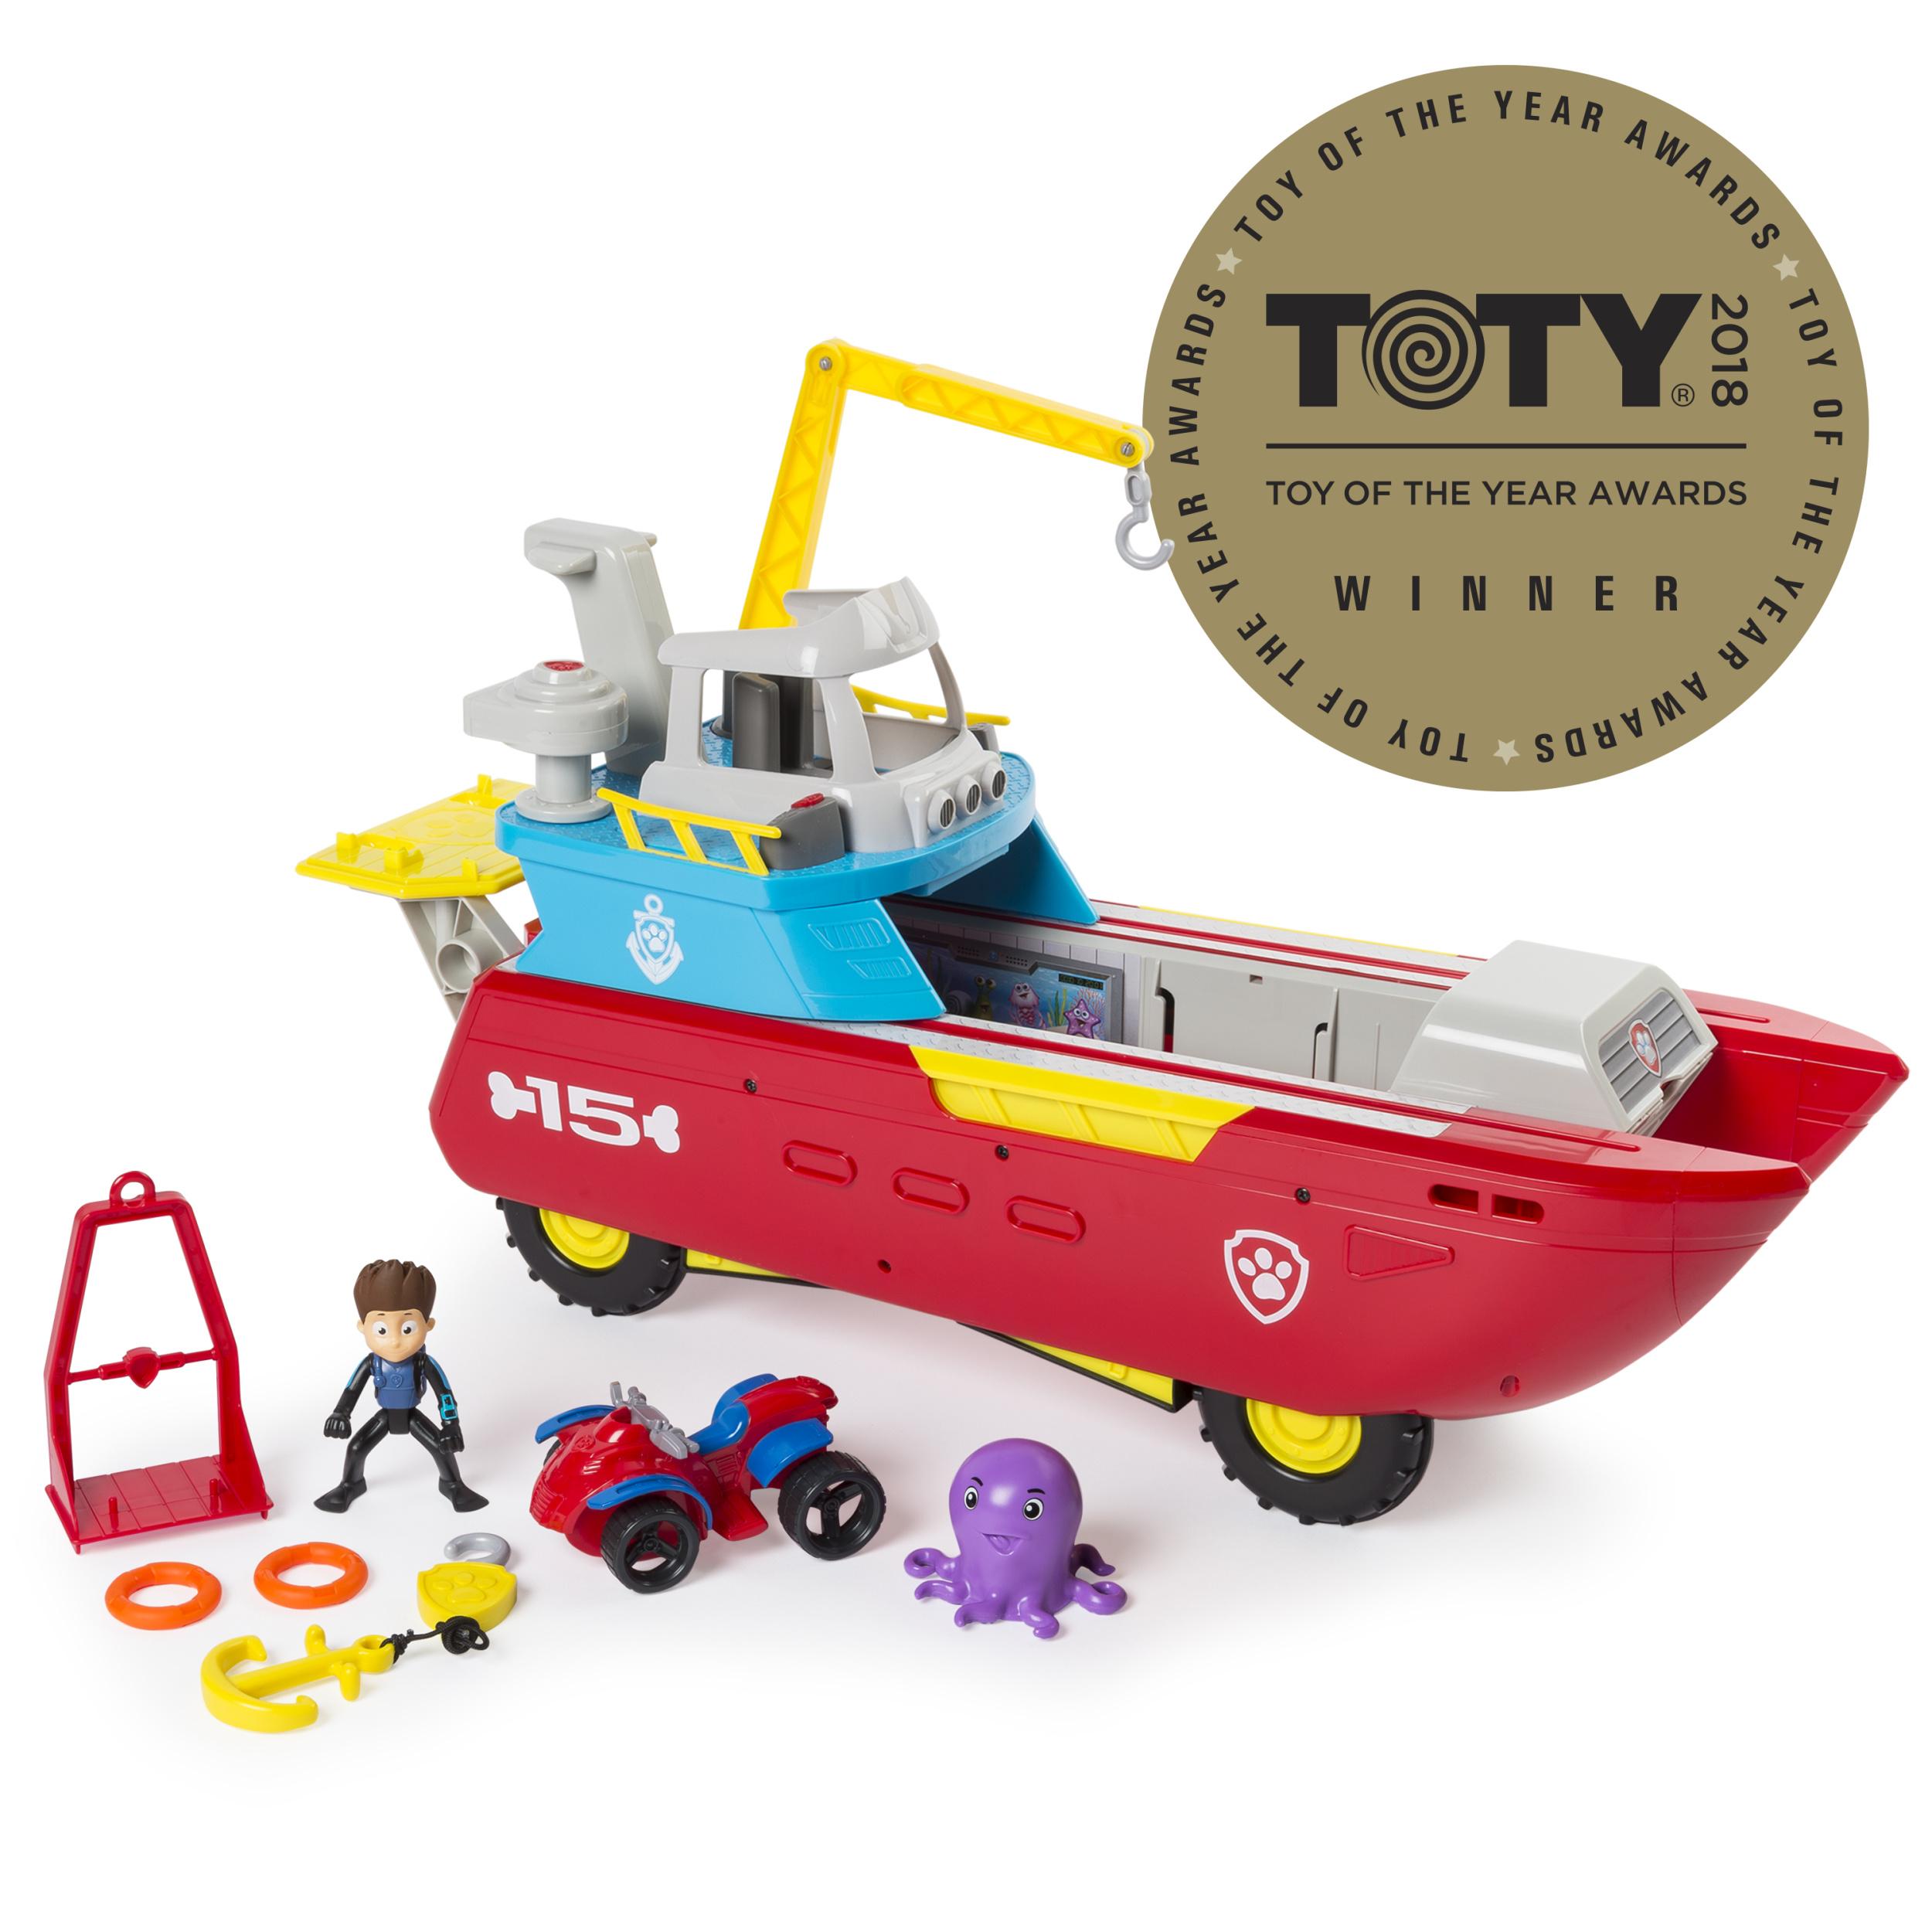 YMMV Paw Patrol Sea Patroller $5.00